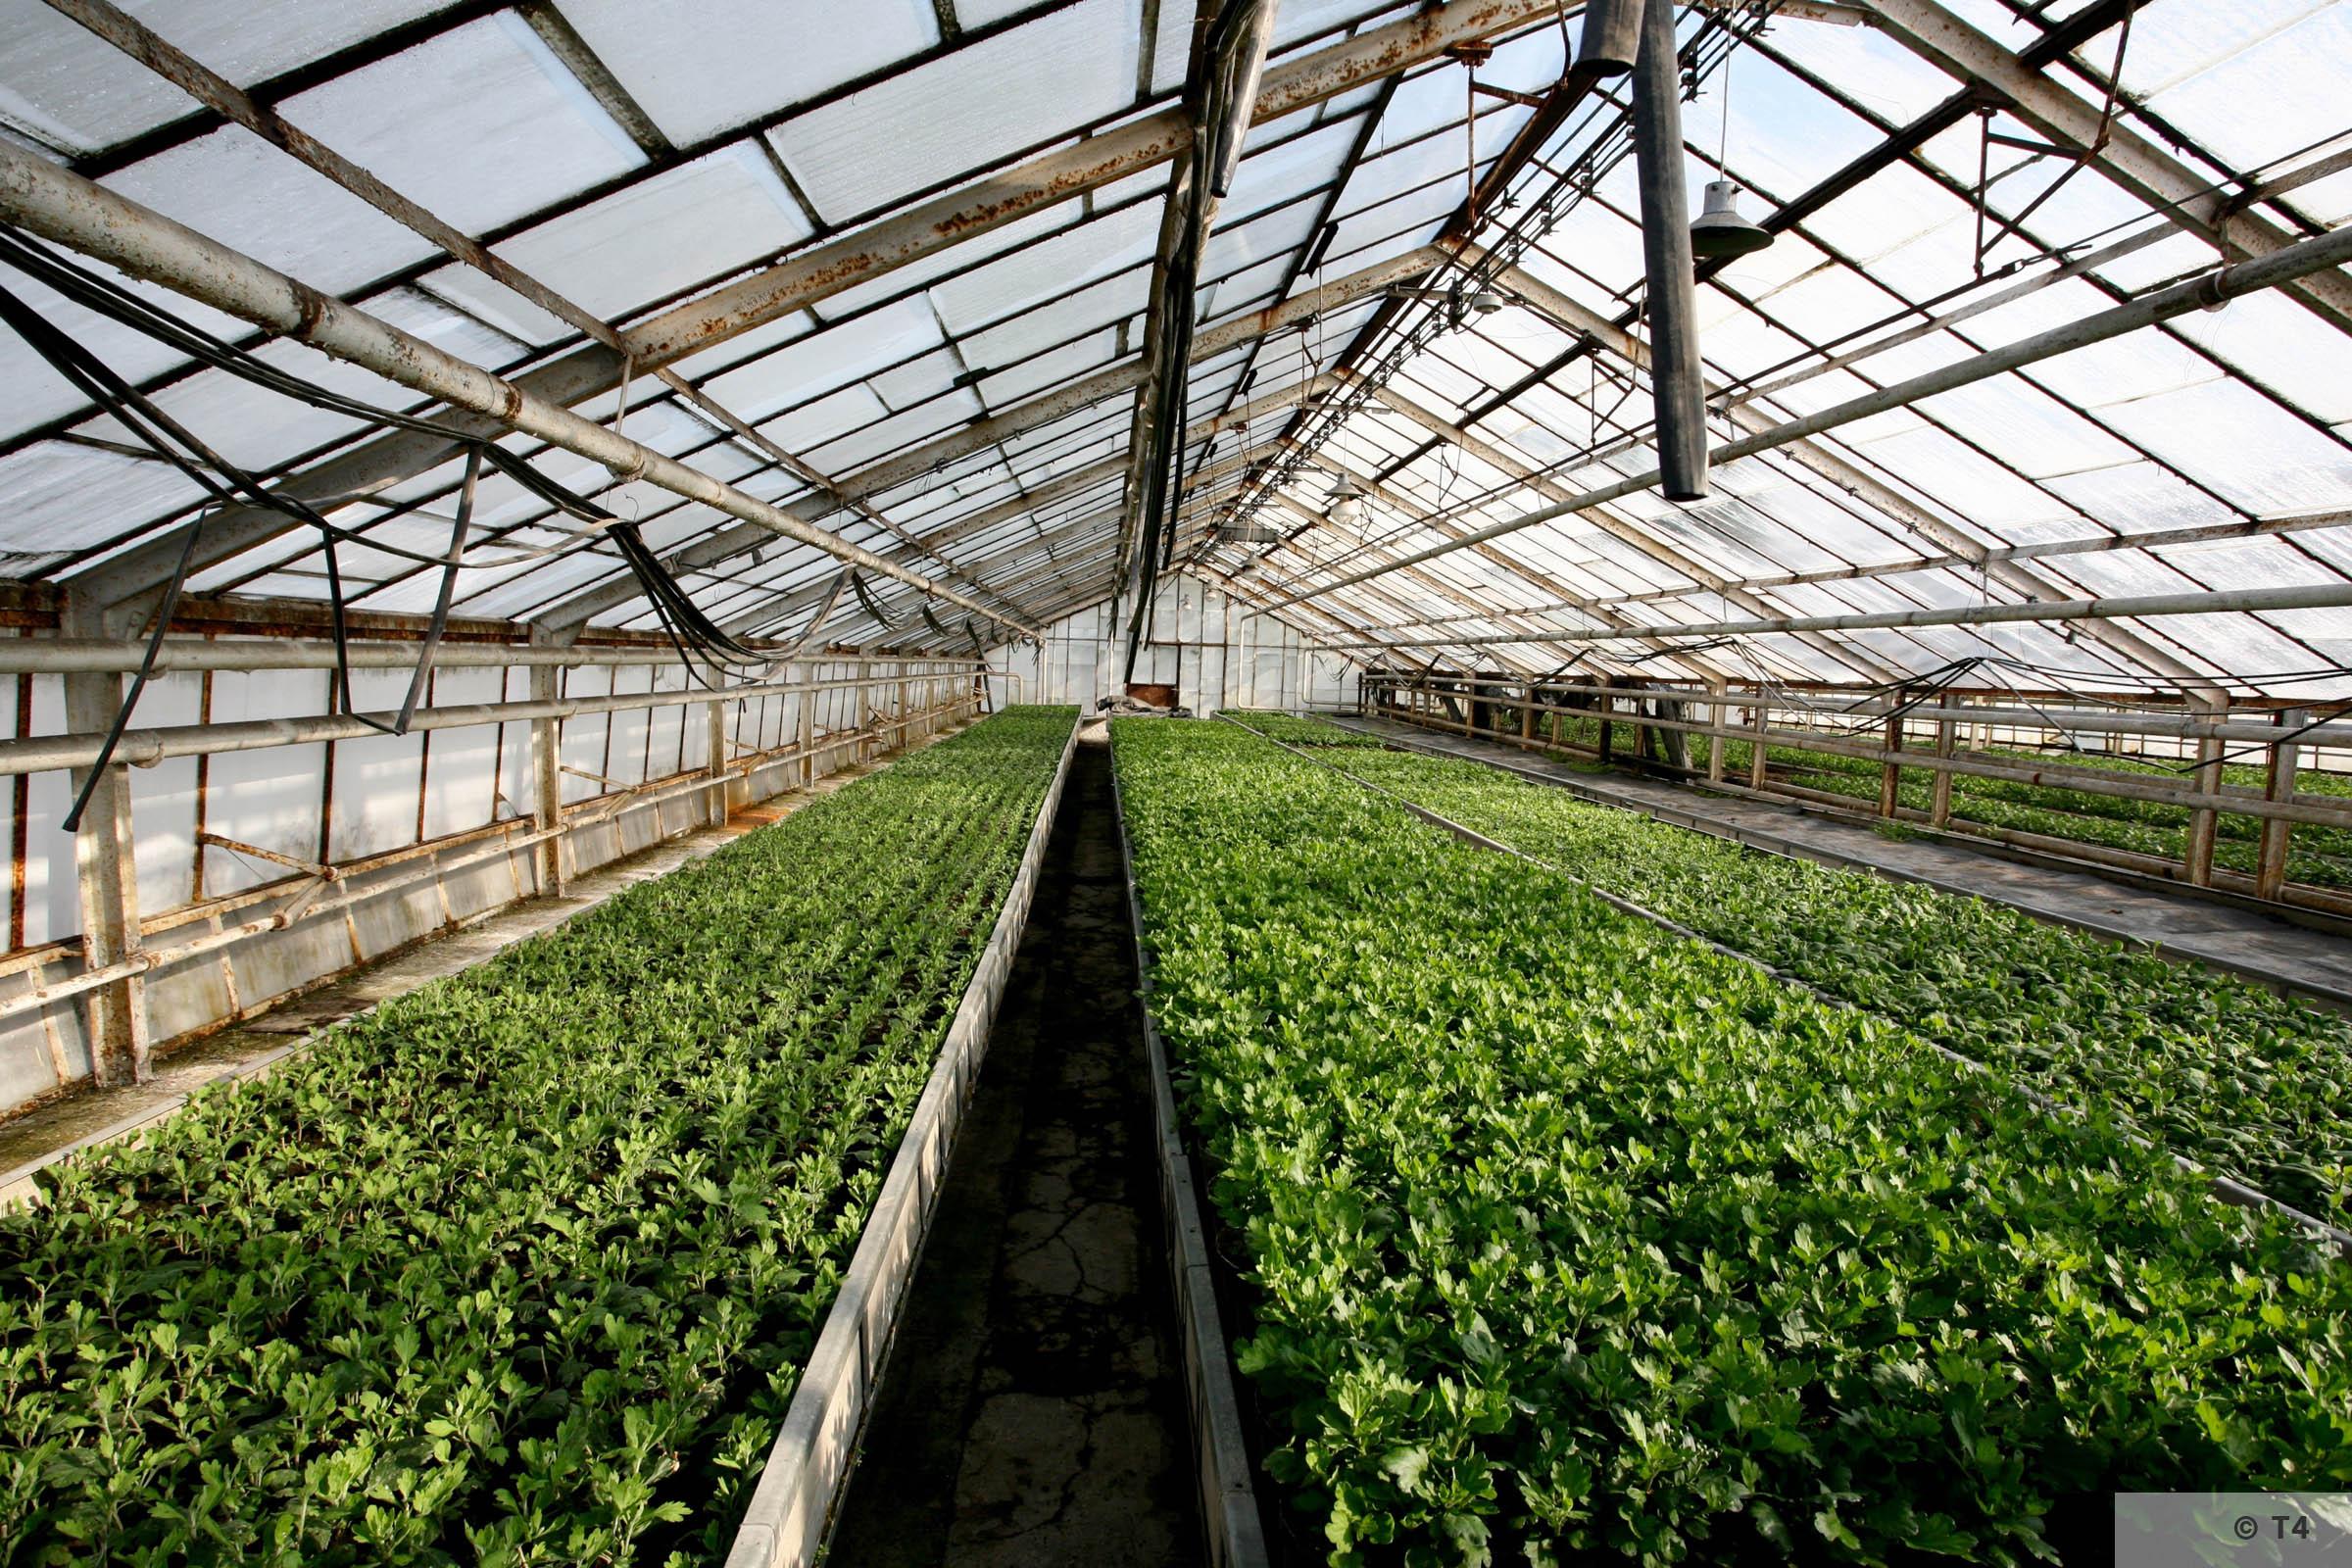 New greenhouses. 2006 T4 5100